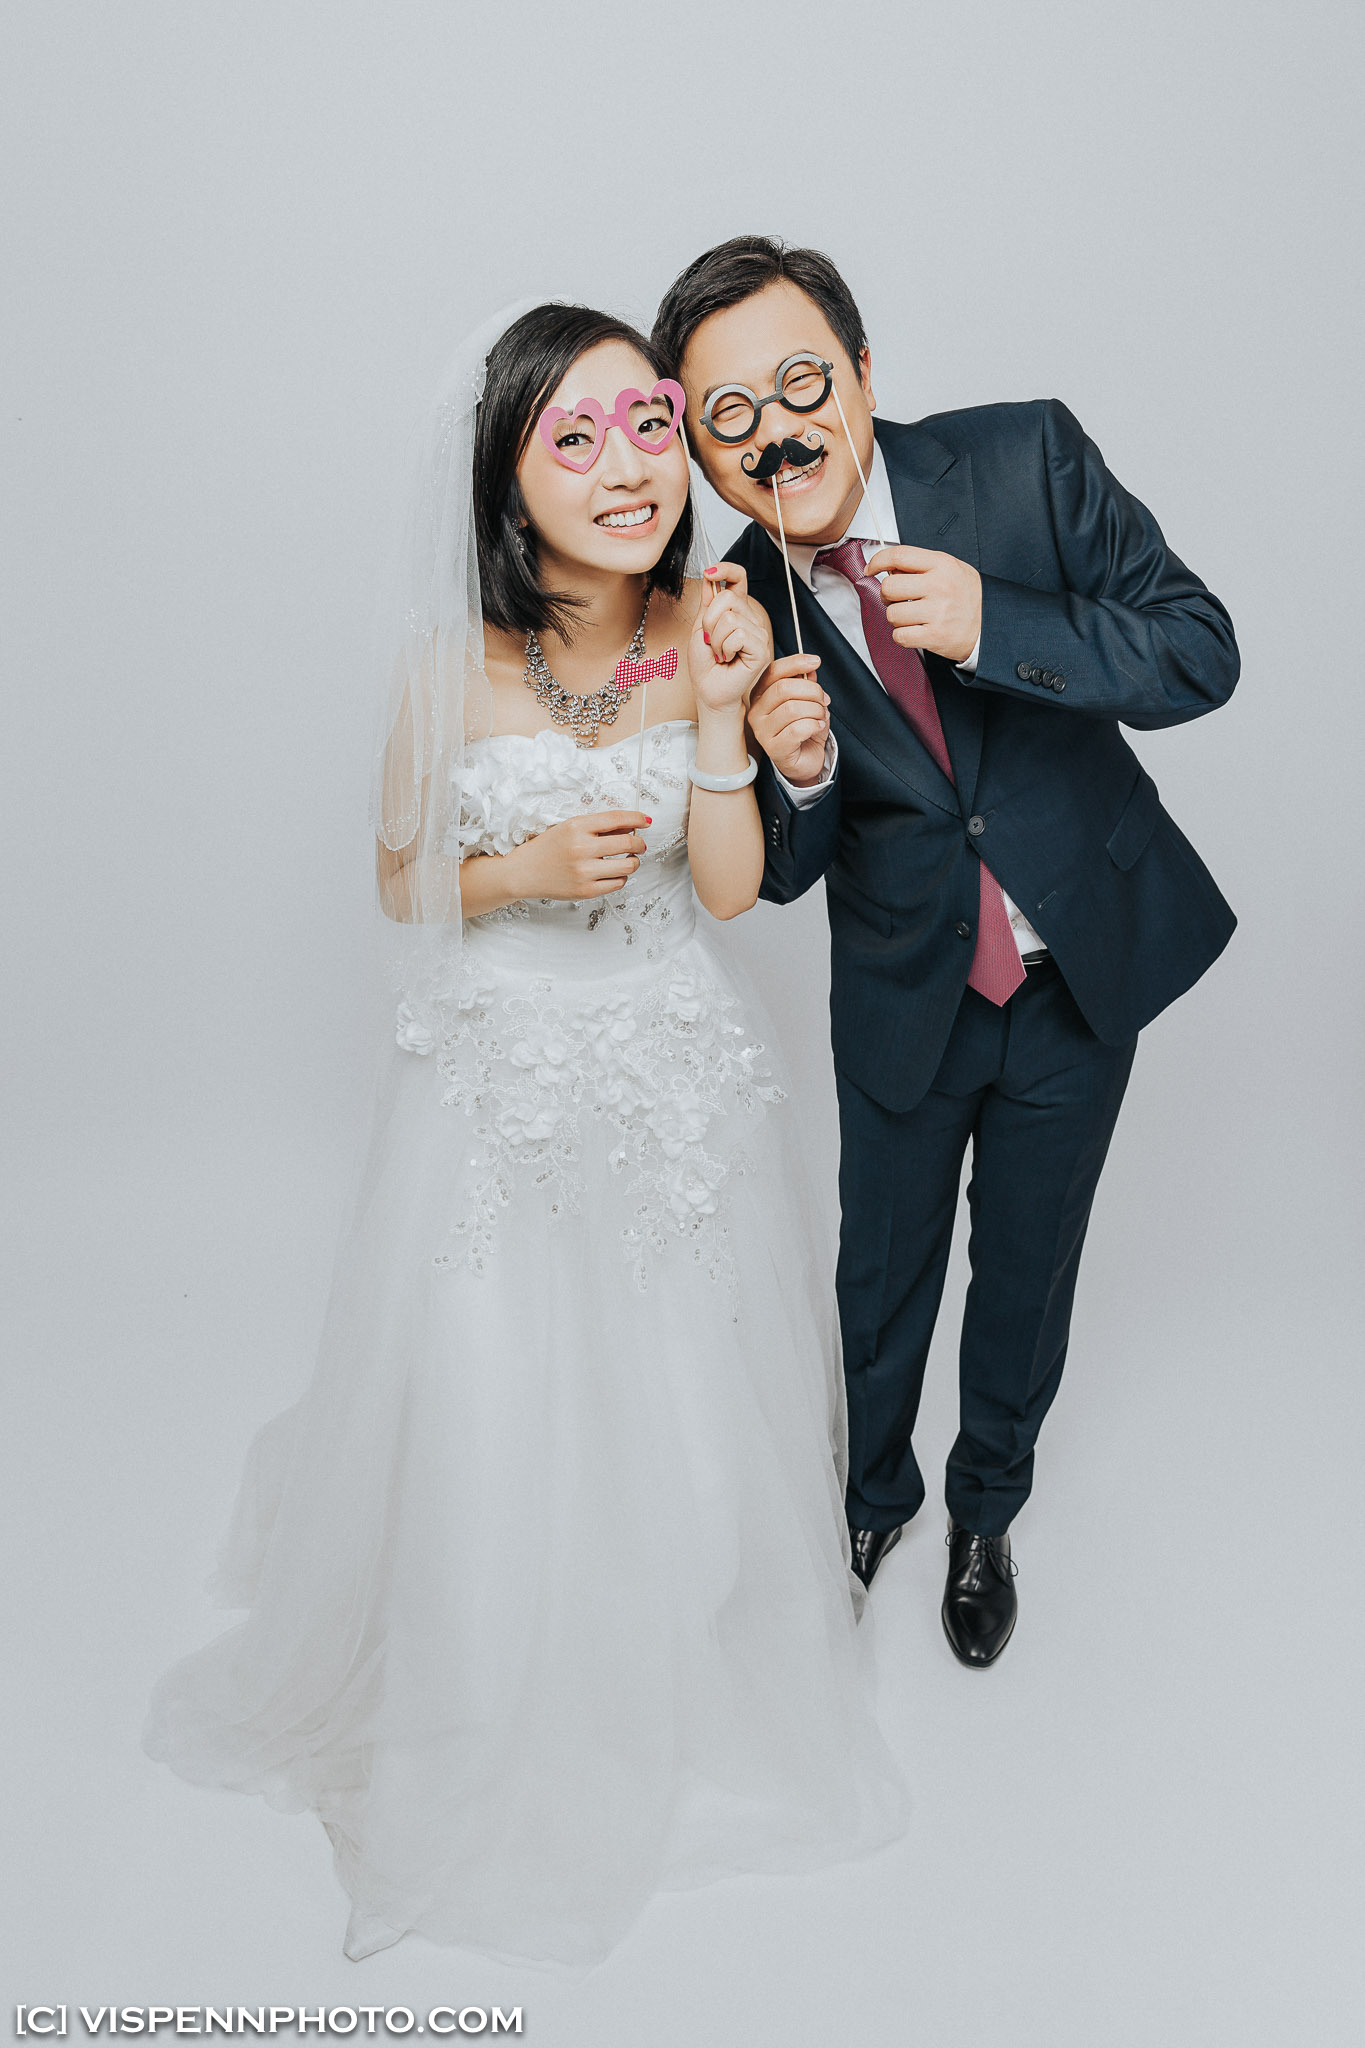 PRE WEDDING Photography Melbourne FangYuan Wedding 1593